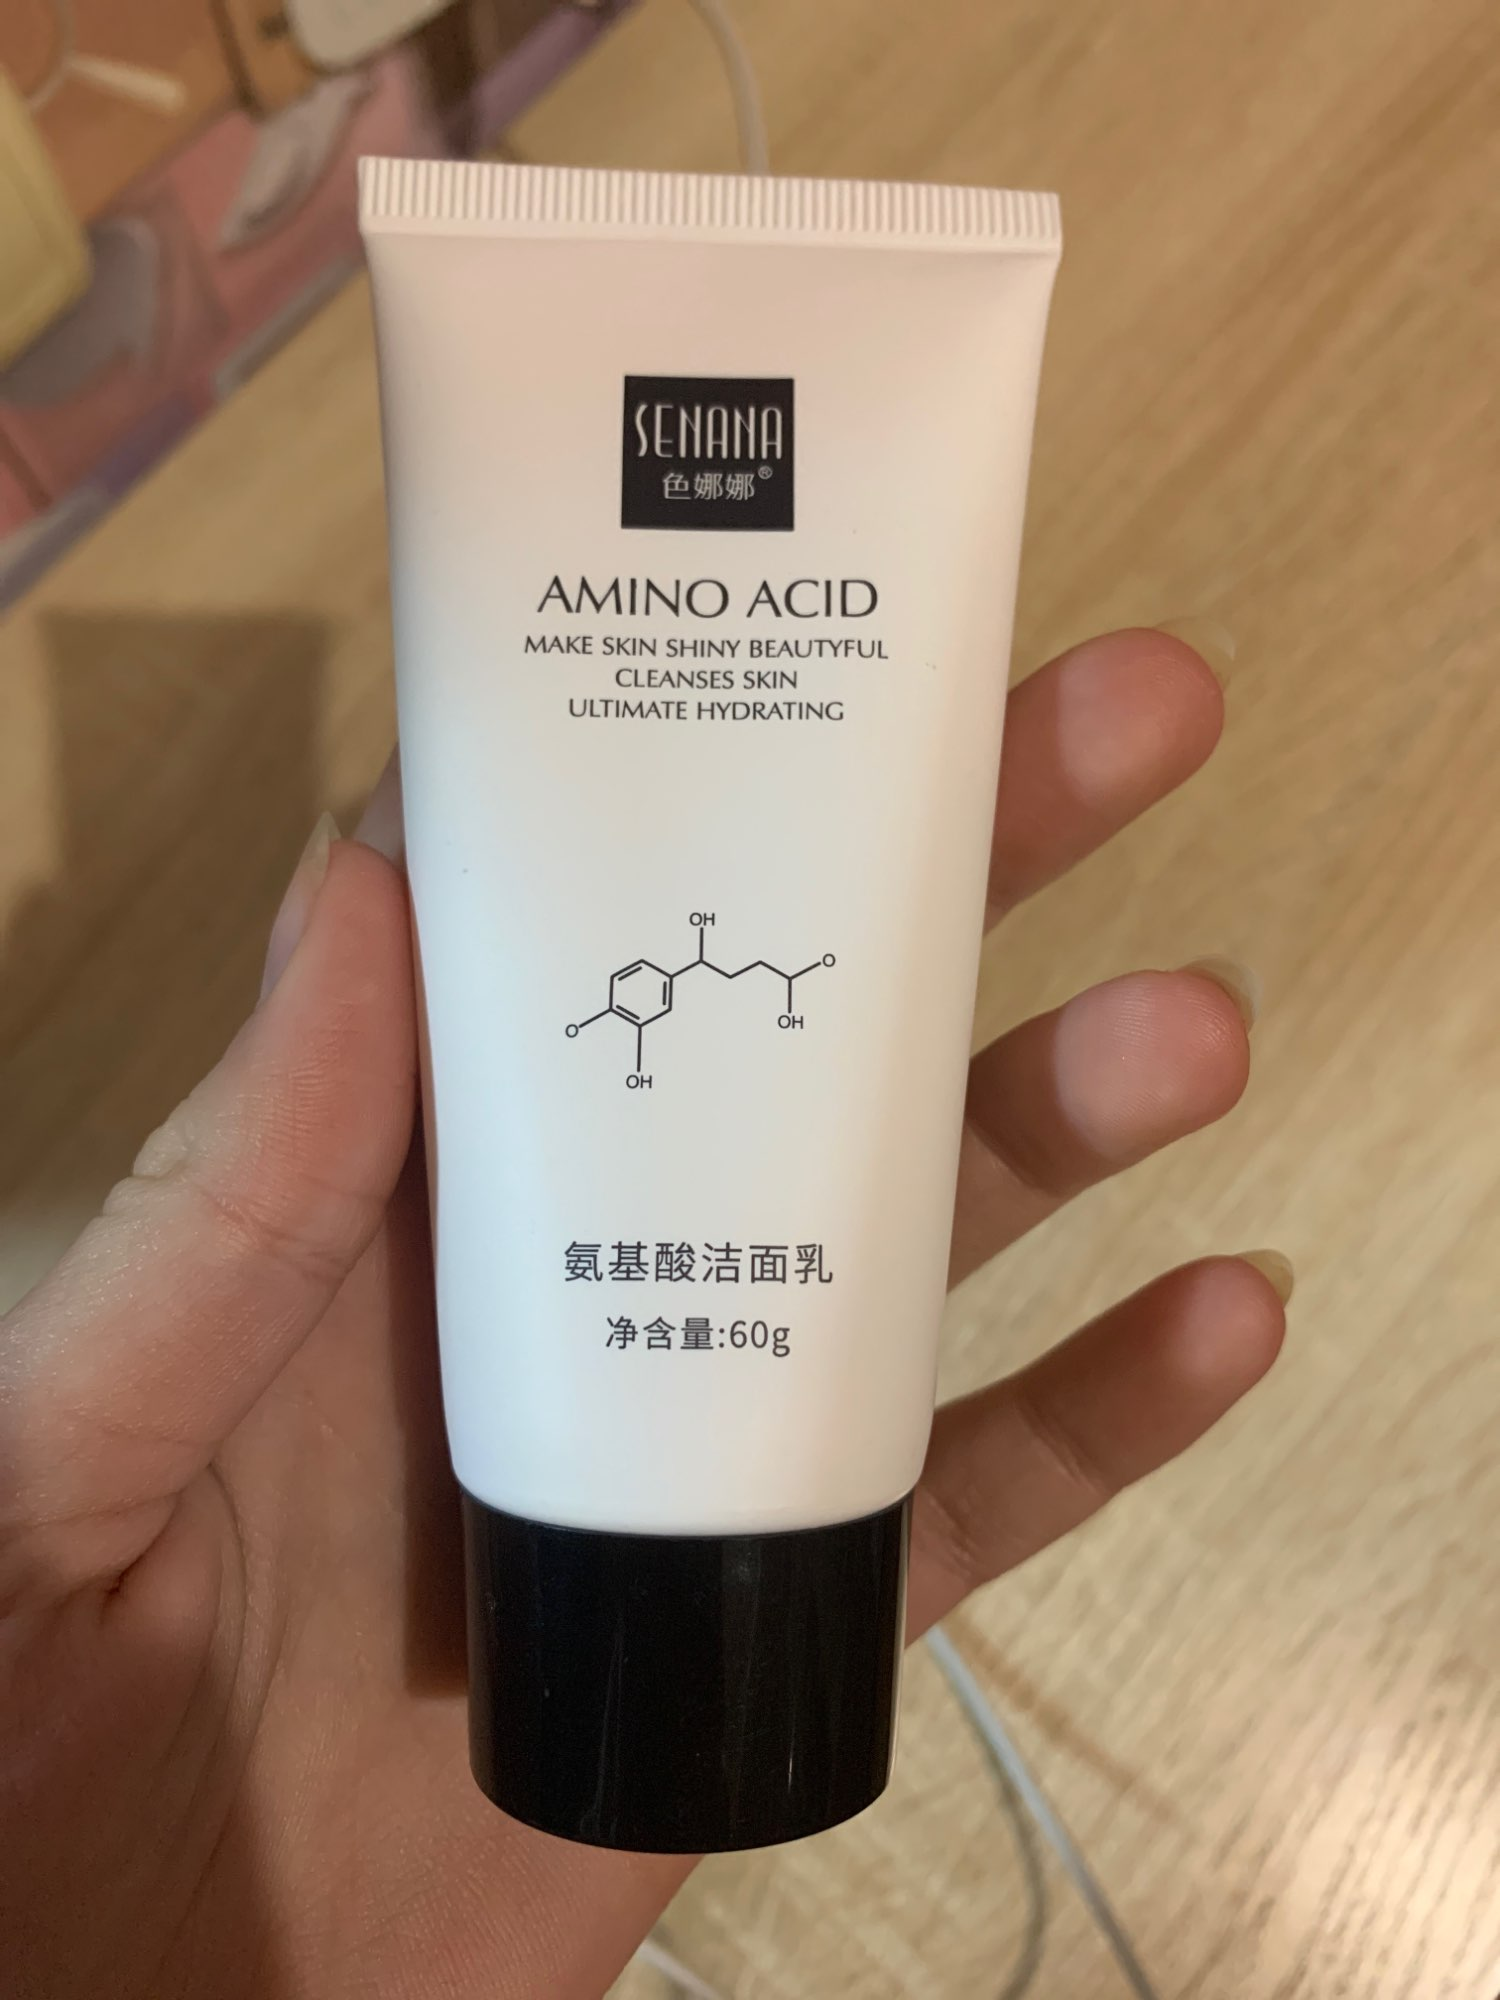 SENANA Nicotinamide Amino Acid Face Cleanser photo review